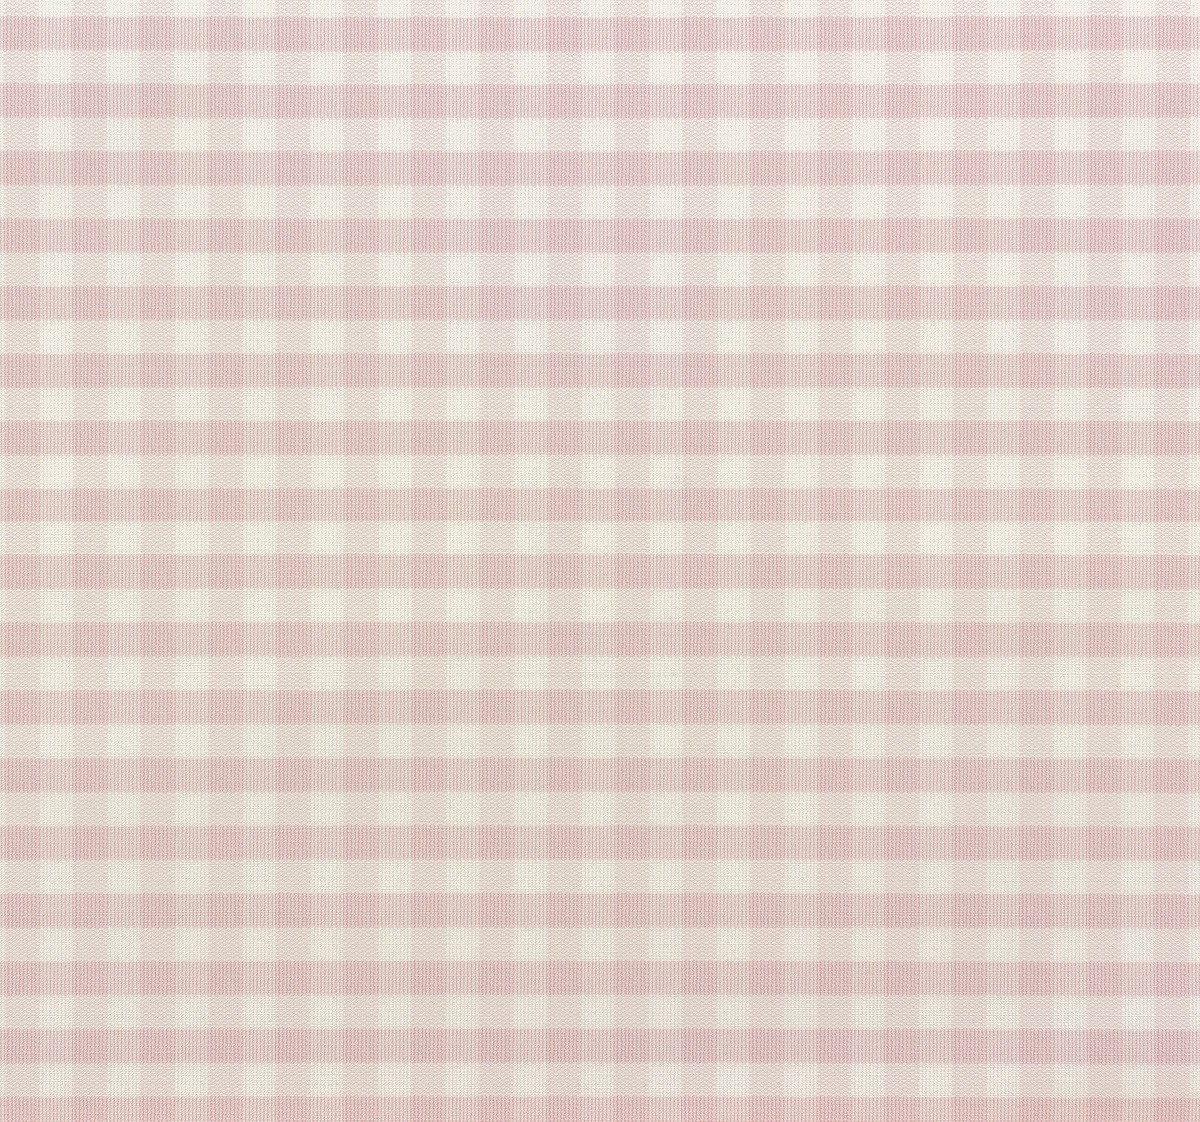 tapete rasch vliestapete lazy sunday 451726 checkered rose. Black Bedroom Furniture Sets. Home Design Ideas